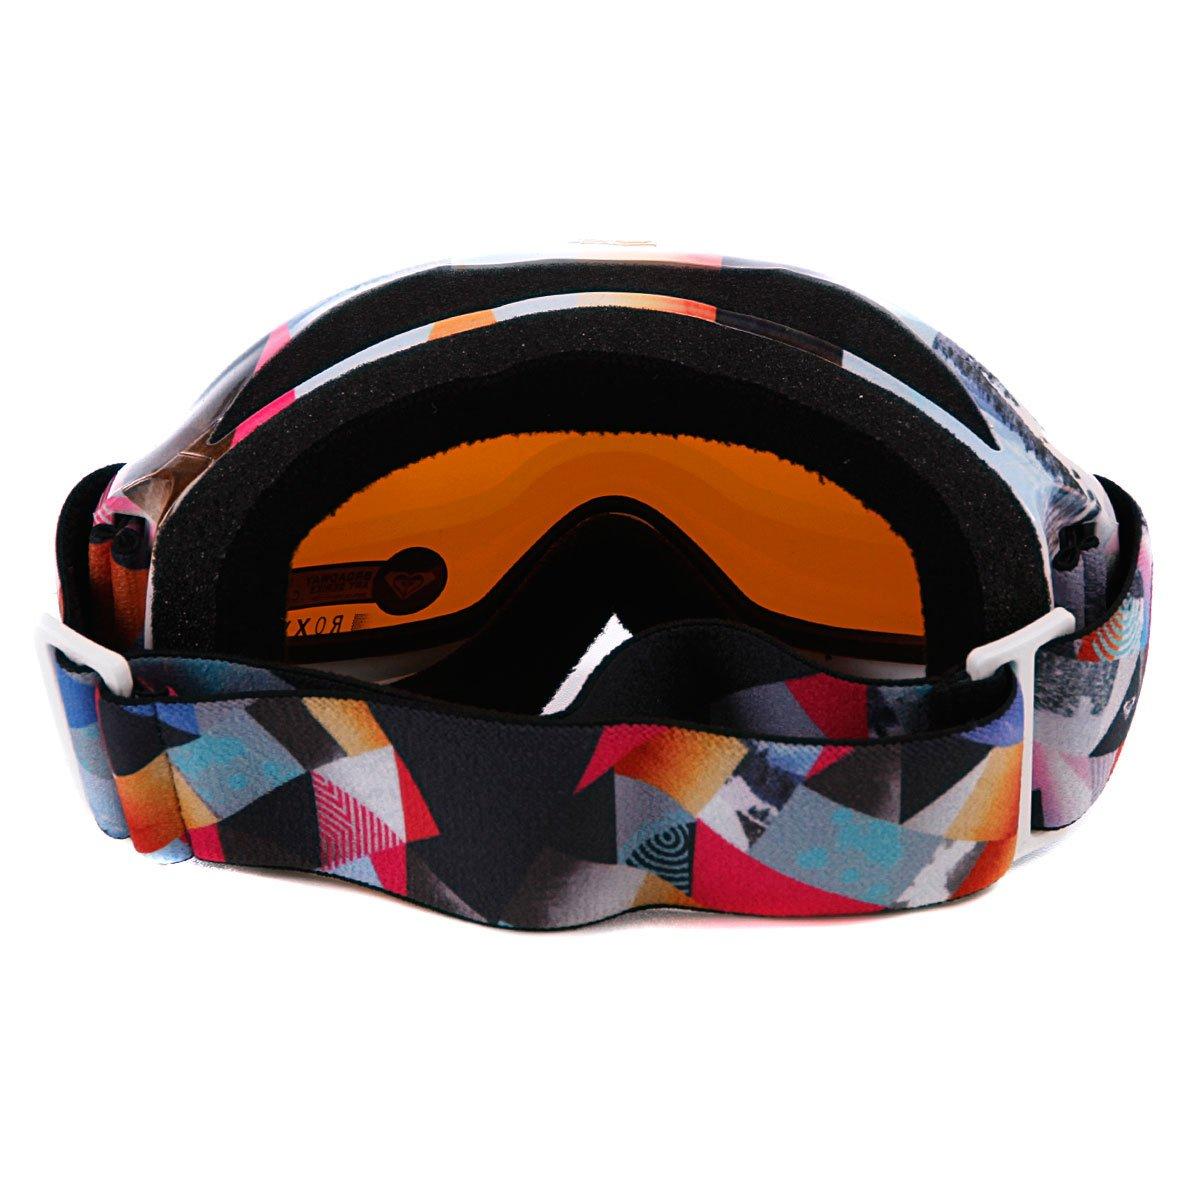 Купить маску женскую Roxy Broadway Art Series Orange Chrome (RGRB02 ... ec0fe70c42f